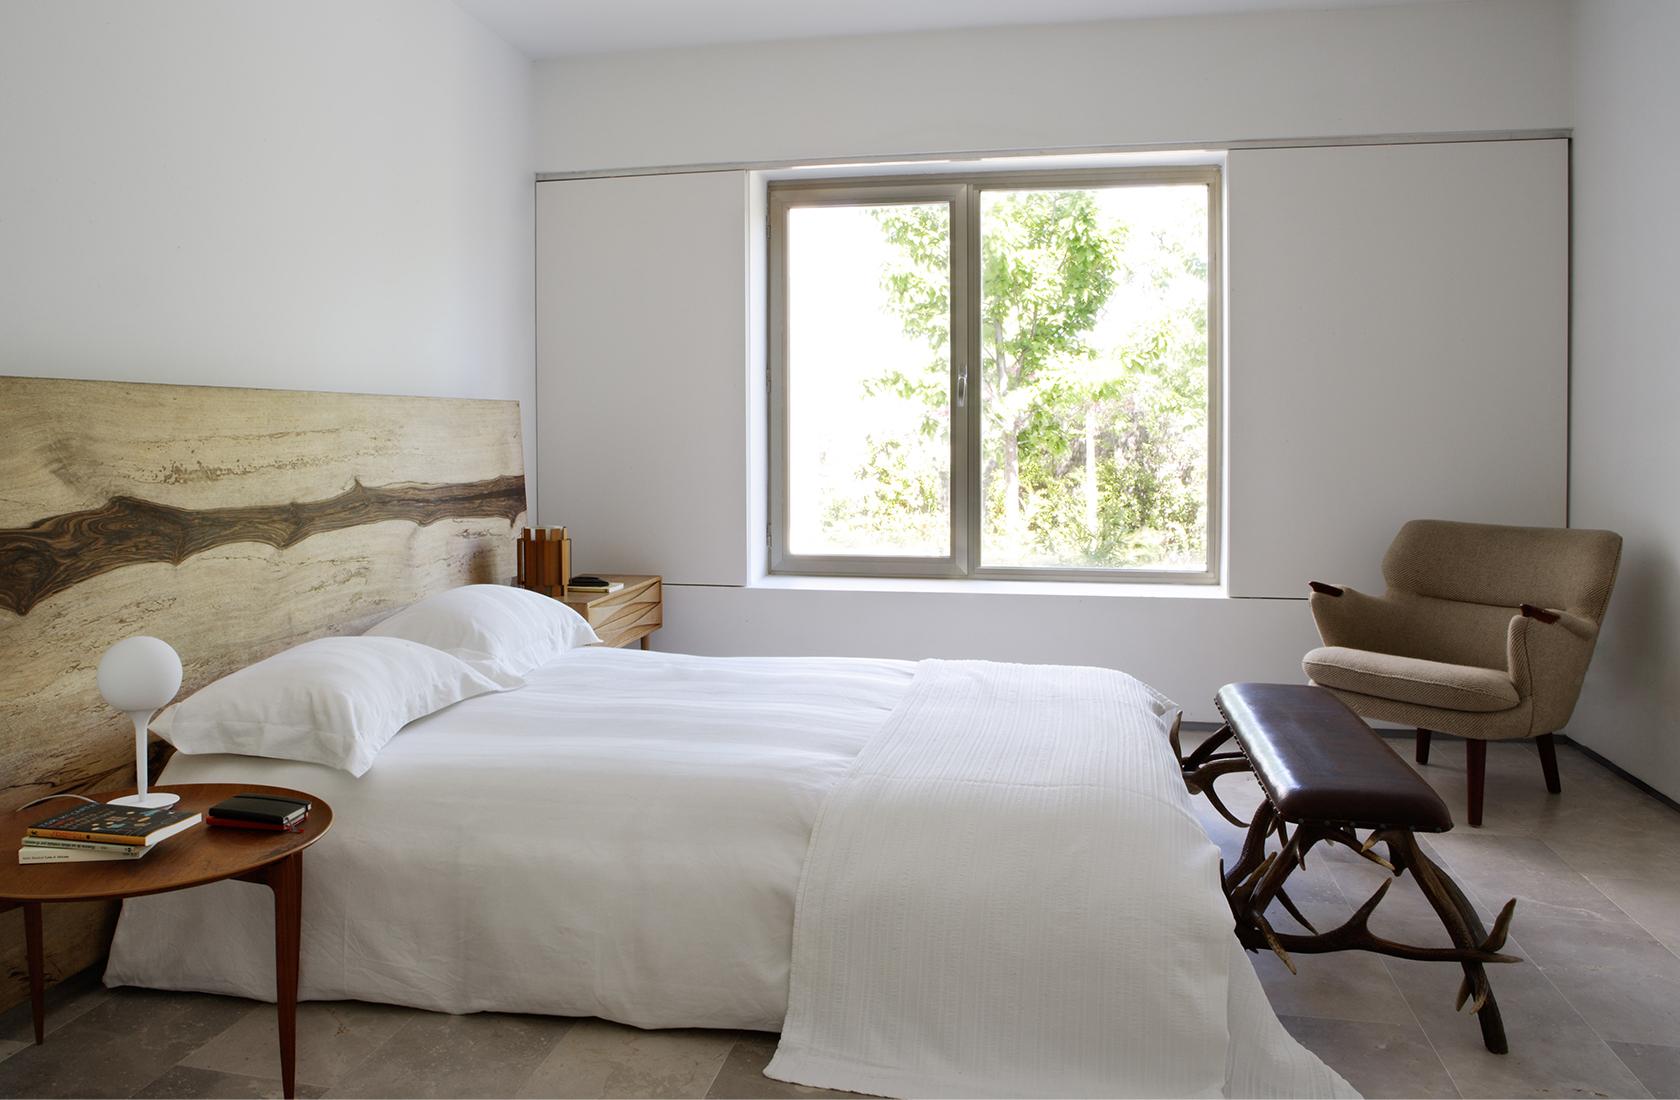 Casa i p dormitorio